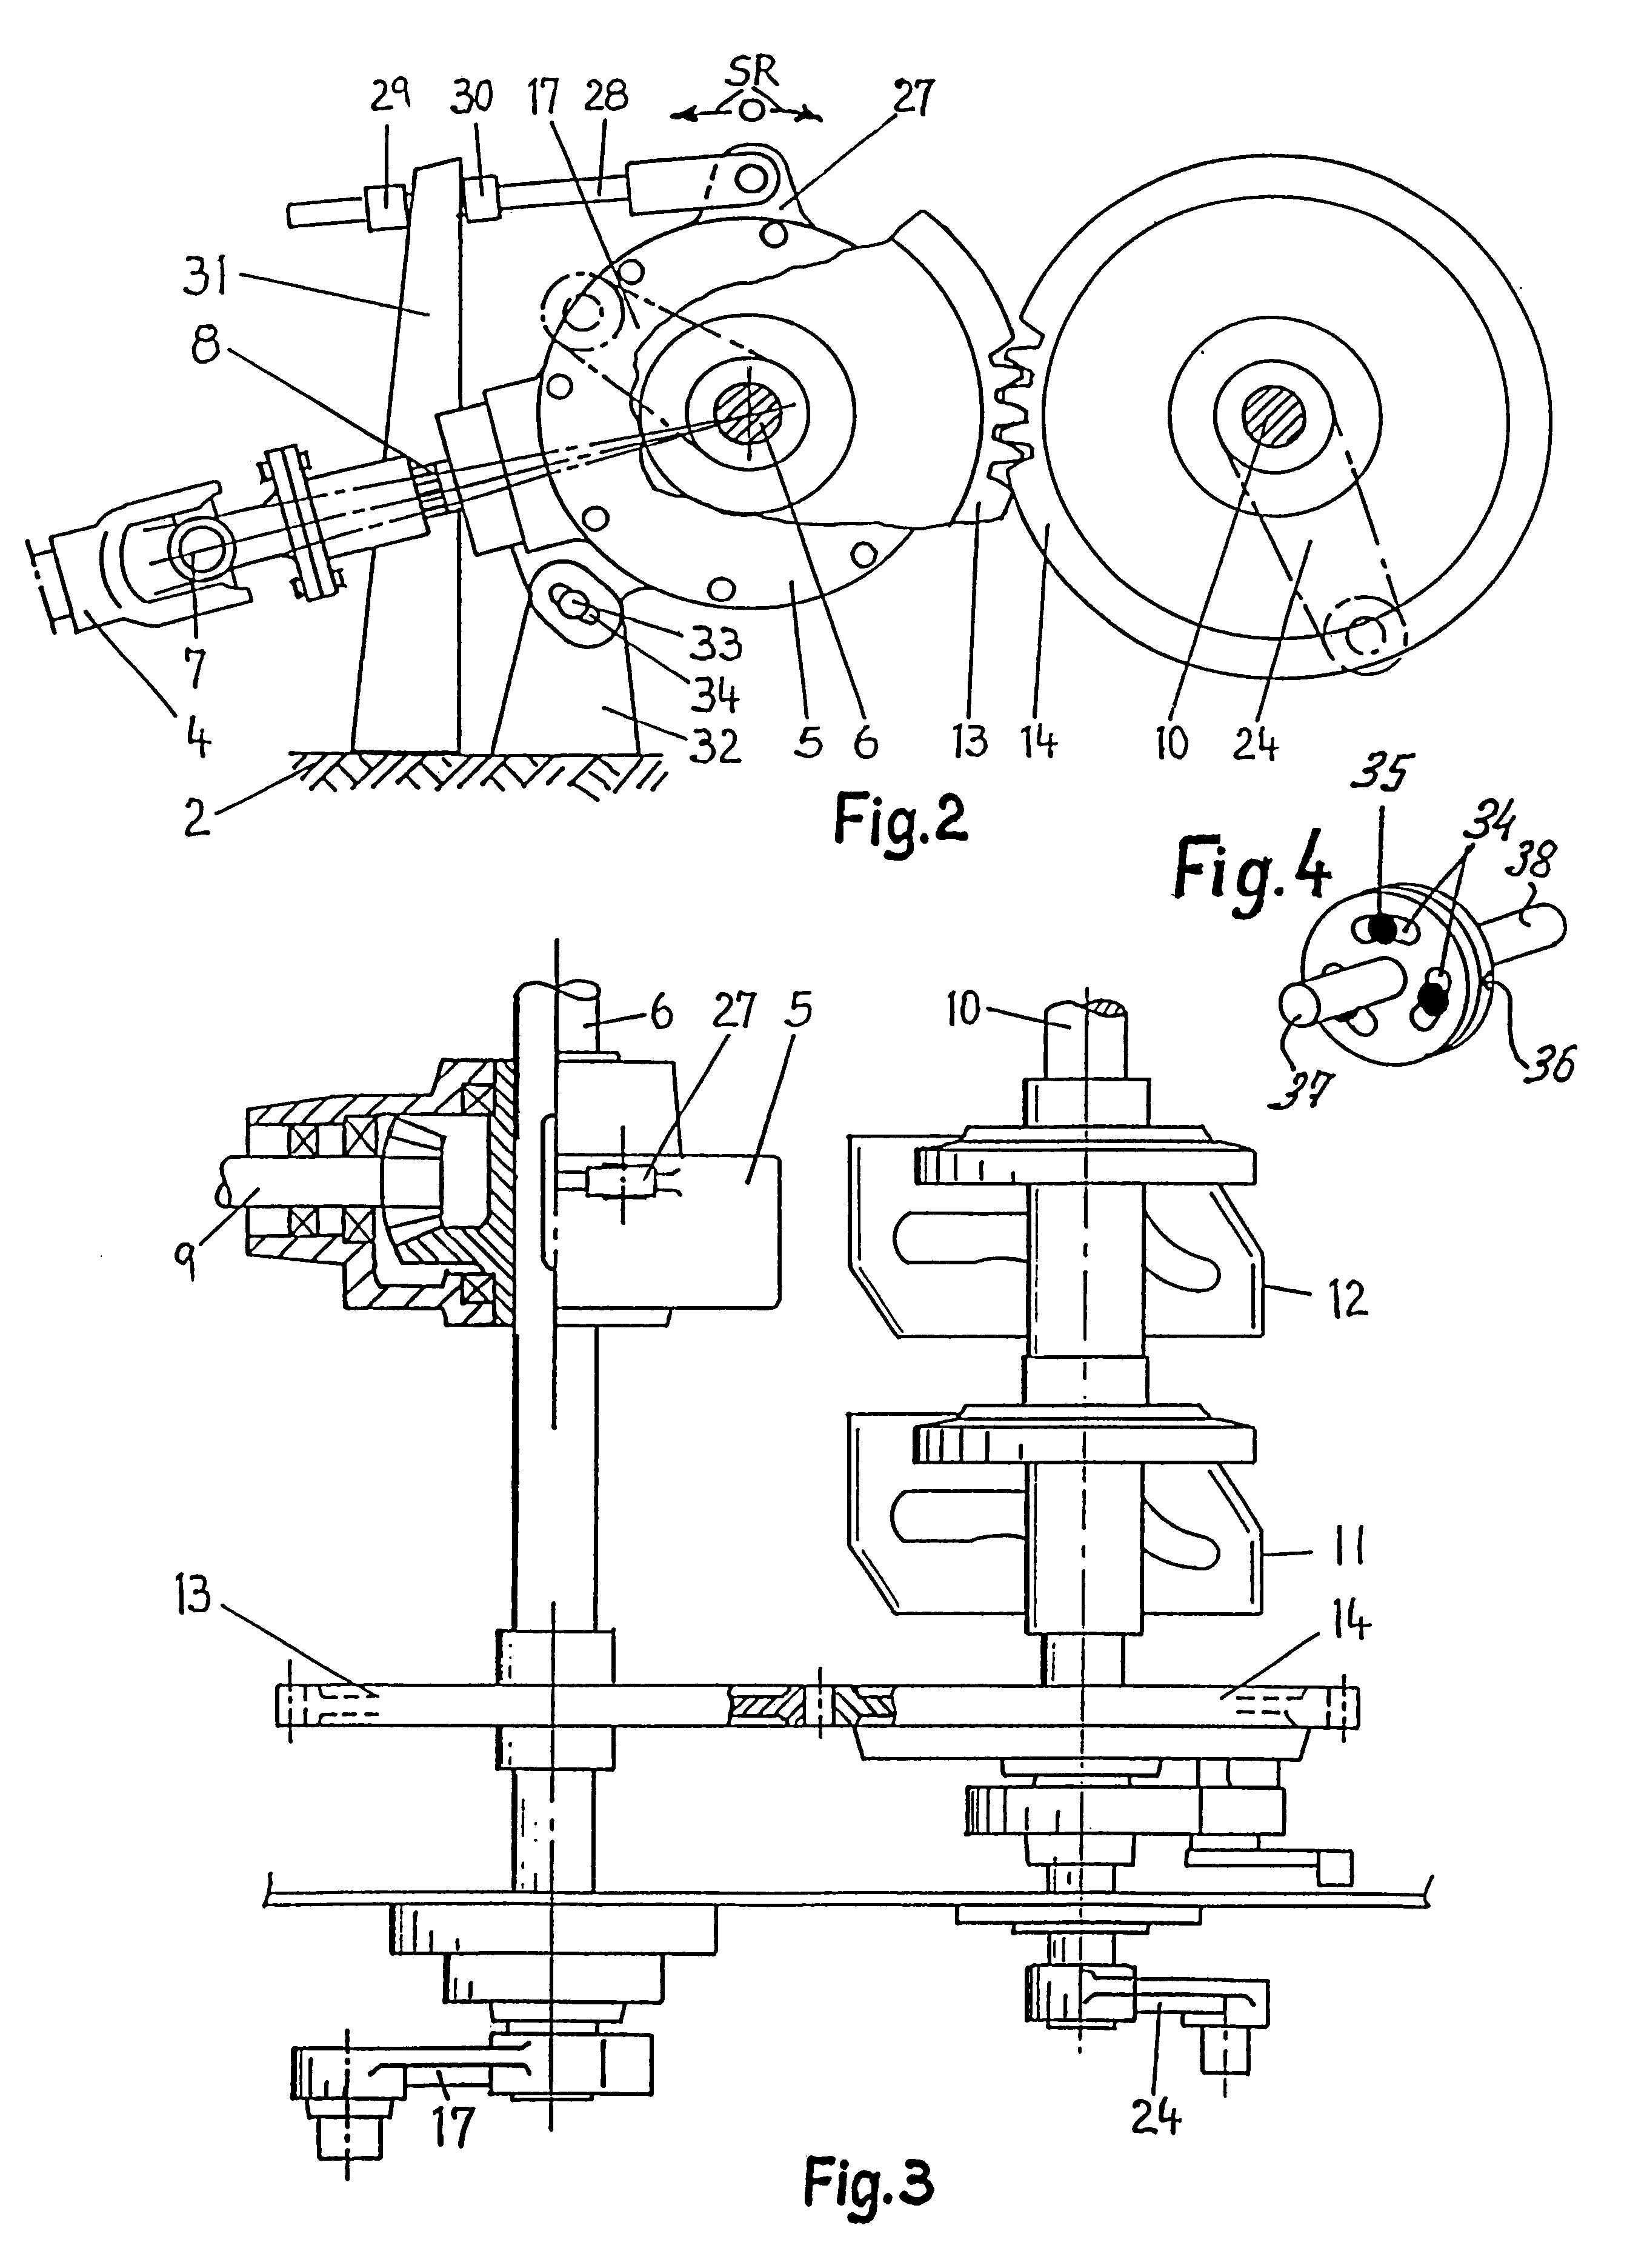 Patent Us6349636 Method And Apparatus For Fine Adjustment Of. Patent Drawing. John Deere. John Deere 14t Baler Pto Shaft Diagram At Scoala.co